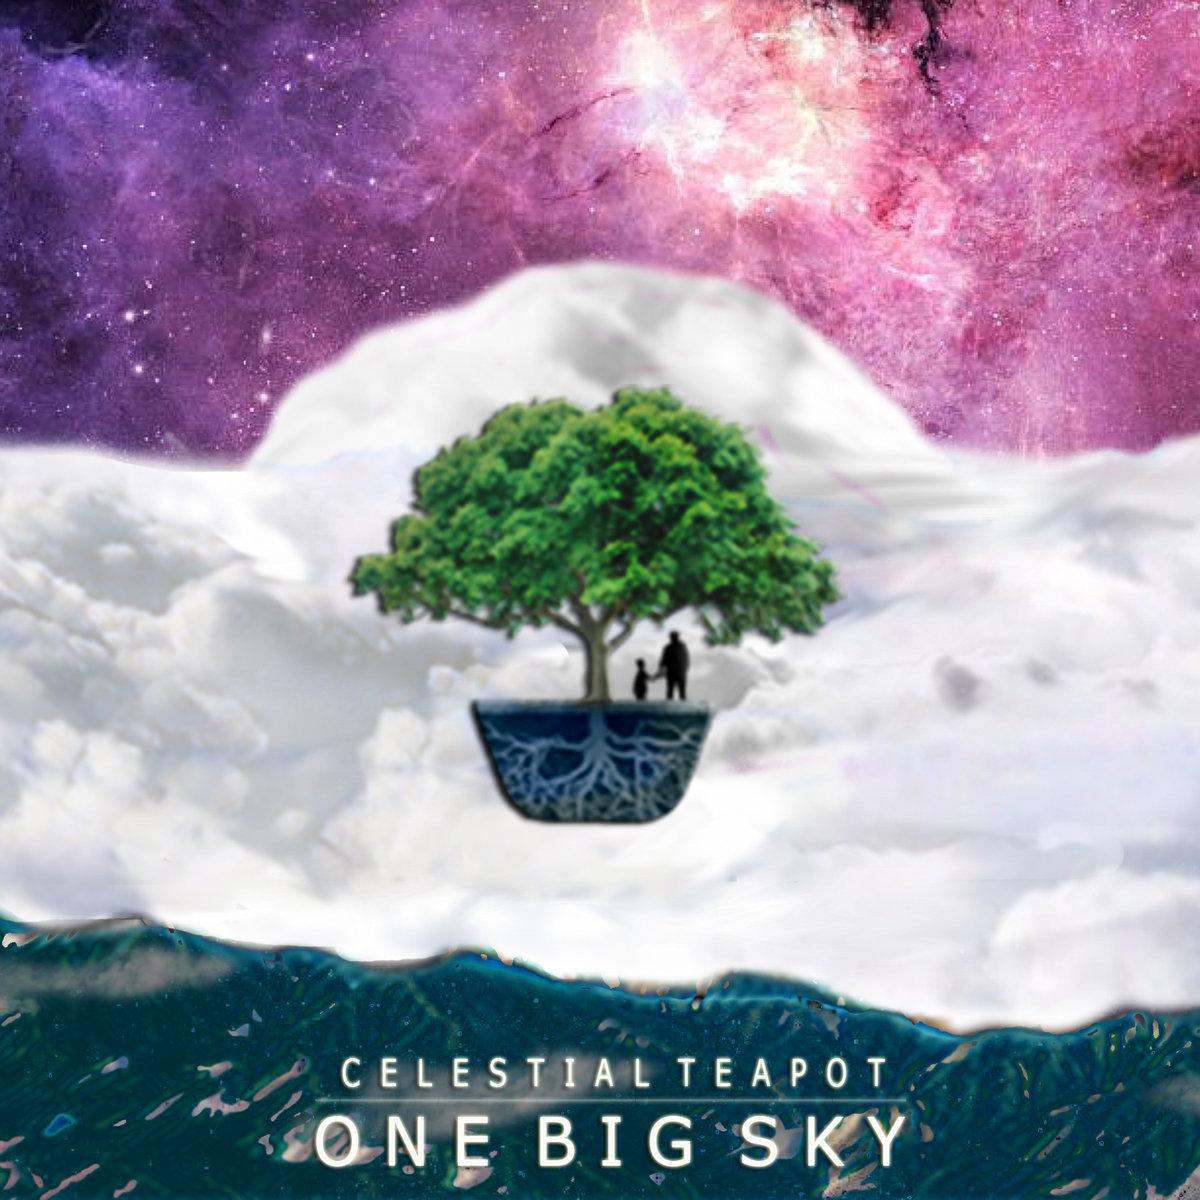 Celestial Teapot: One Big Sky